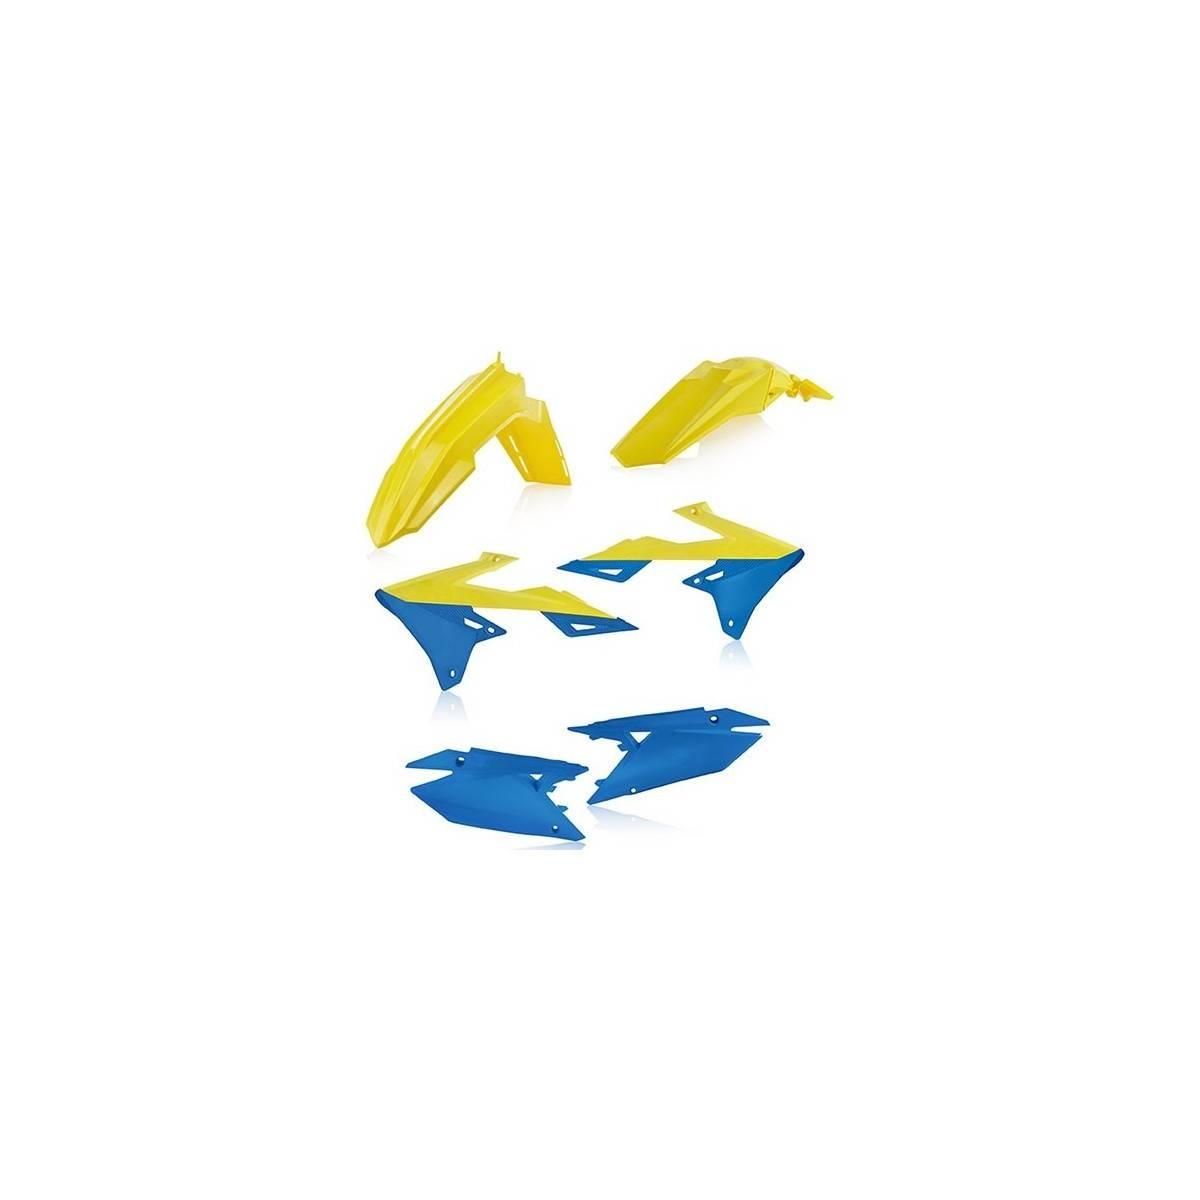 0023066-274 - Kit Plasticos Rmz 450 18 Azul Amarillo